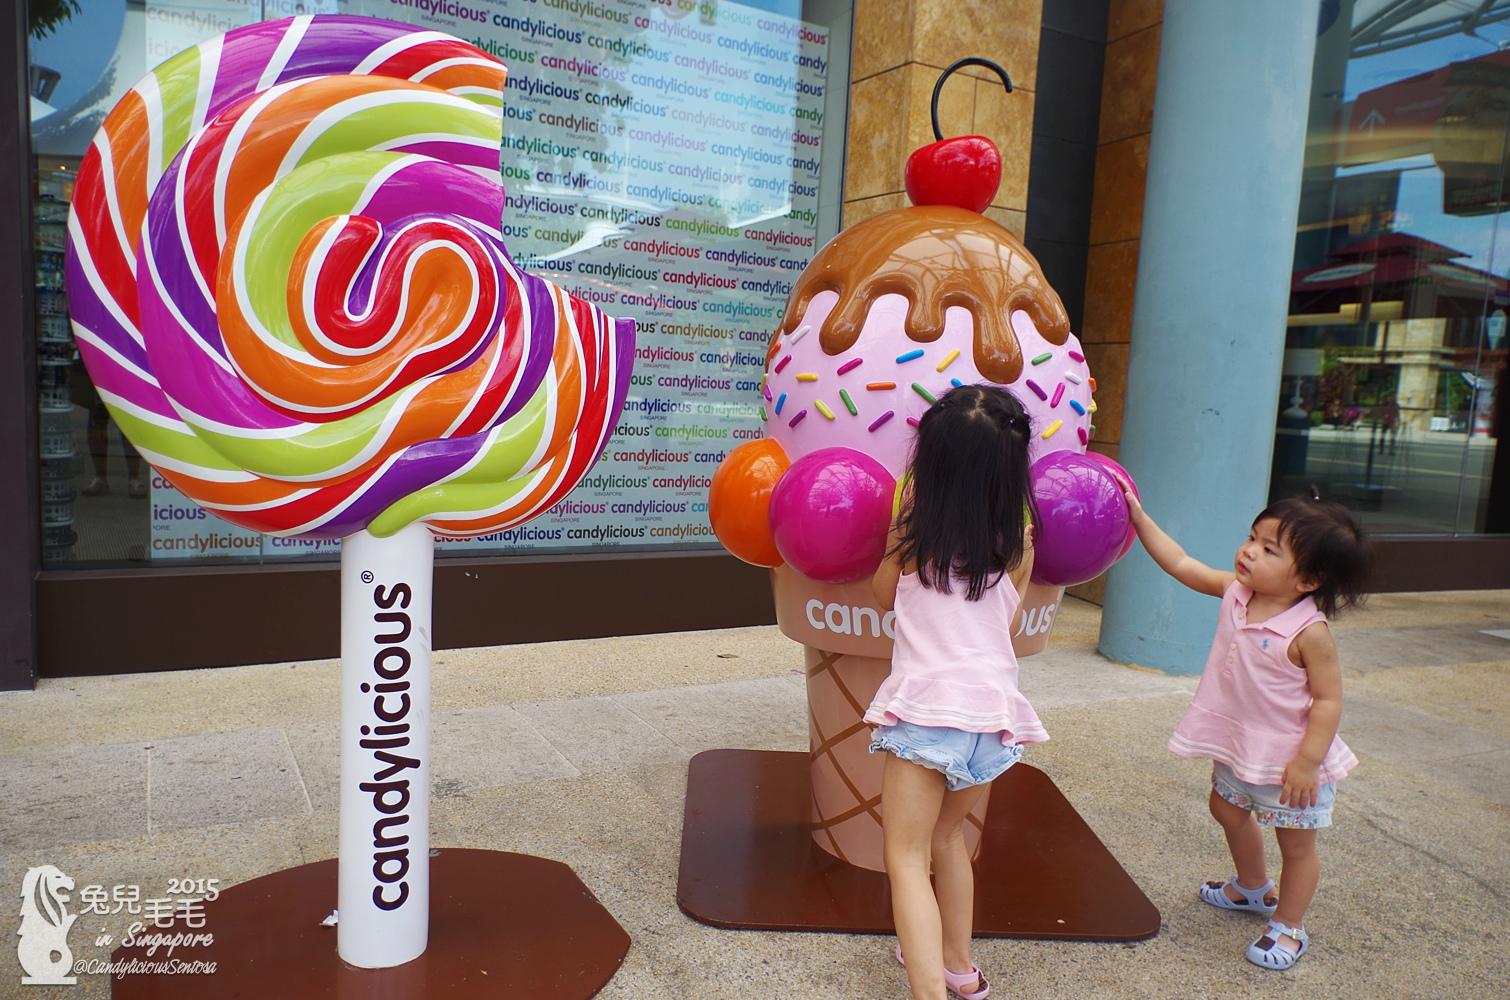 0215-Candylicious-24.jpg